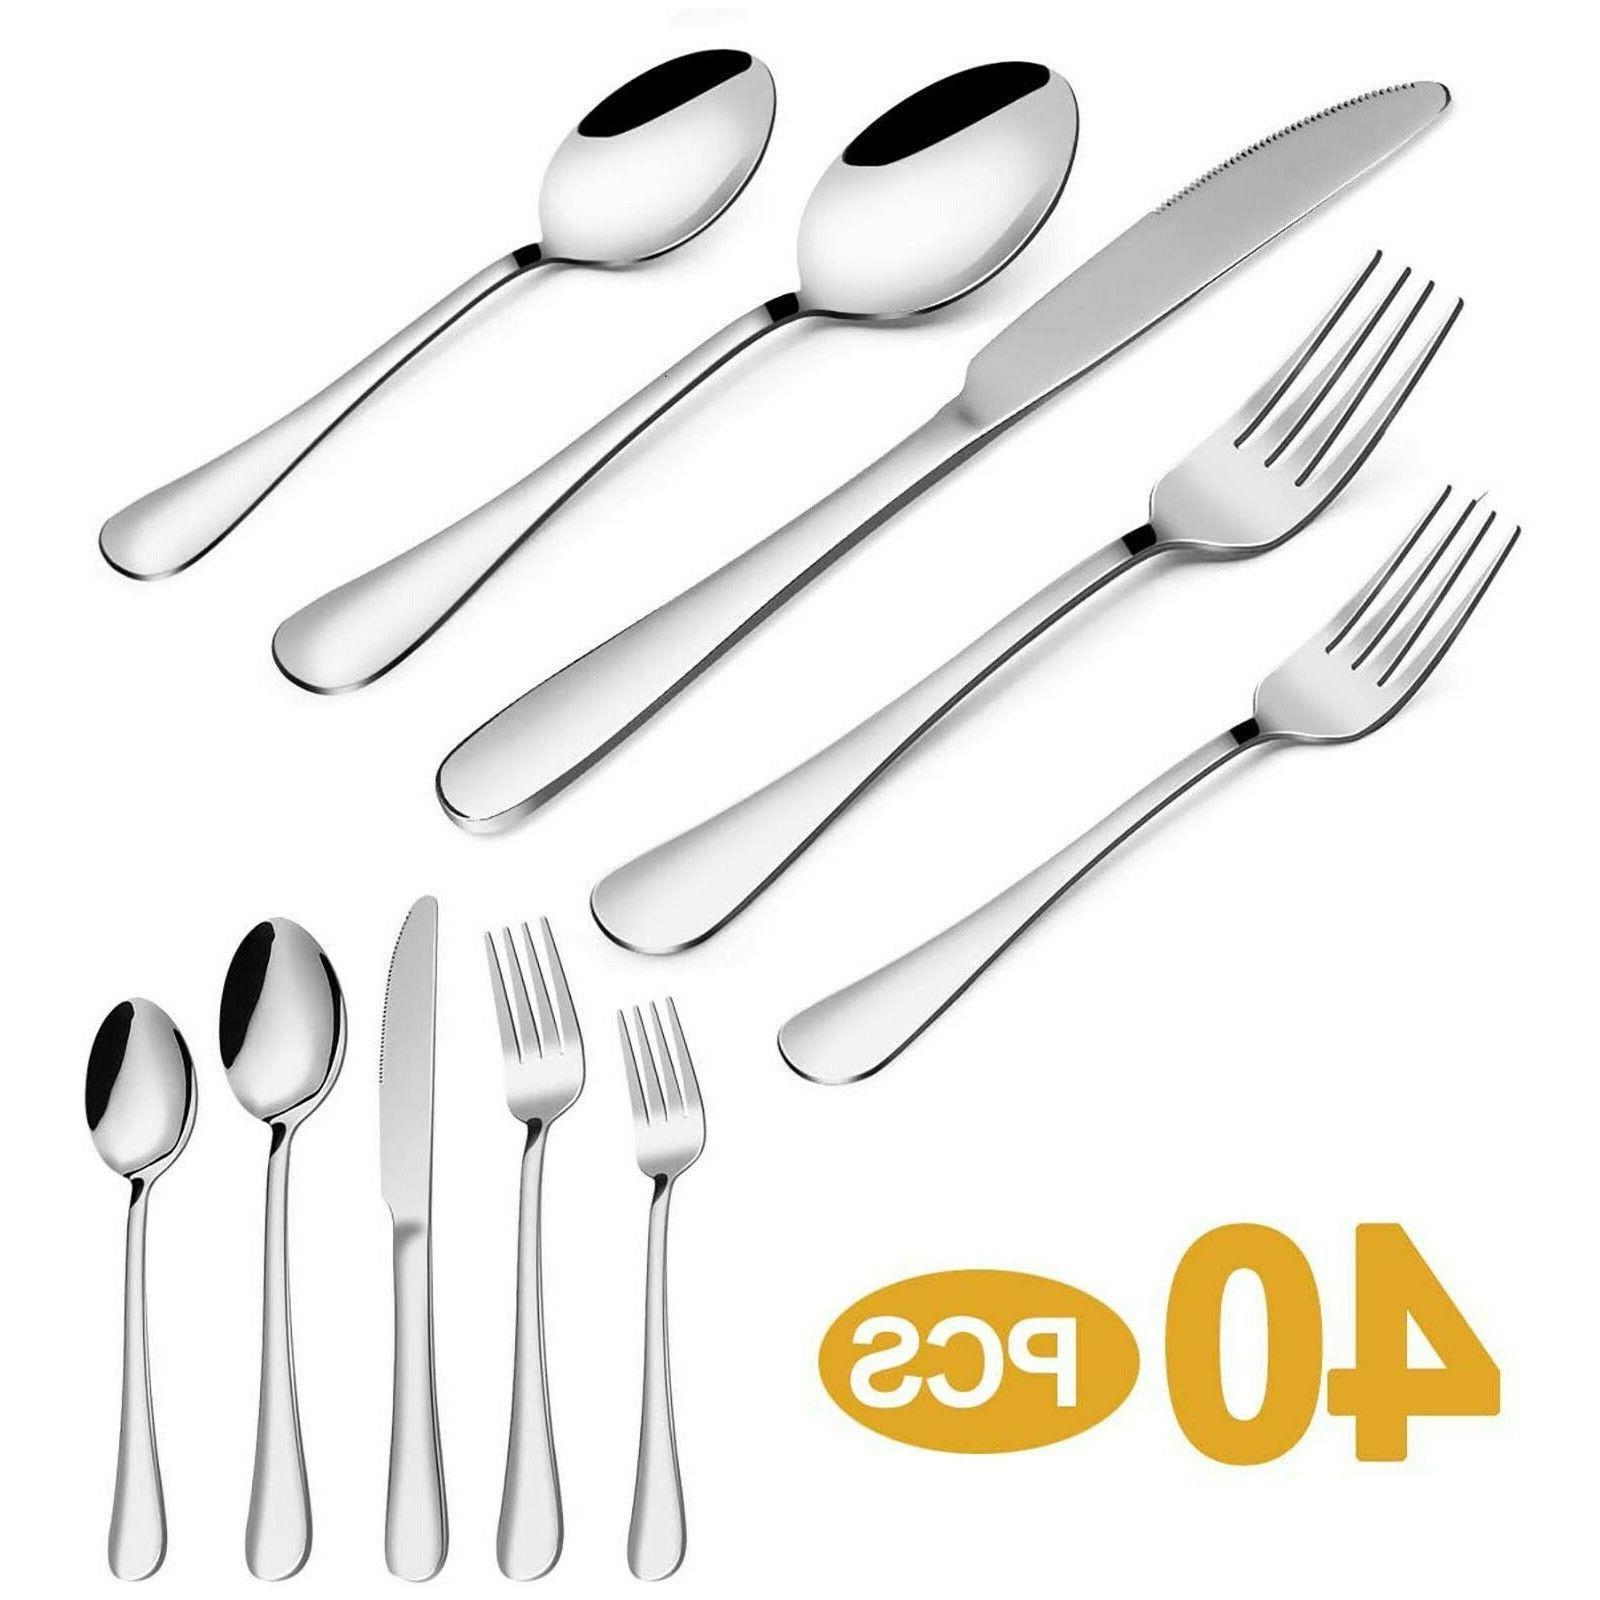 20pcs flatware set cutlery set stainless steel